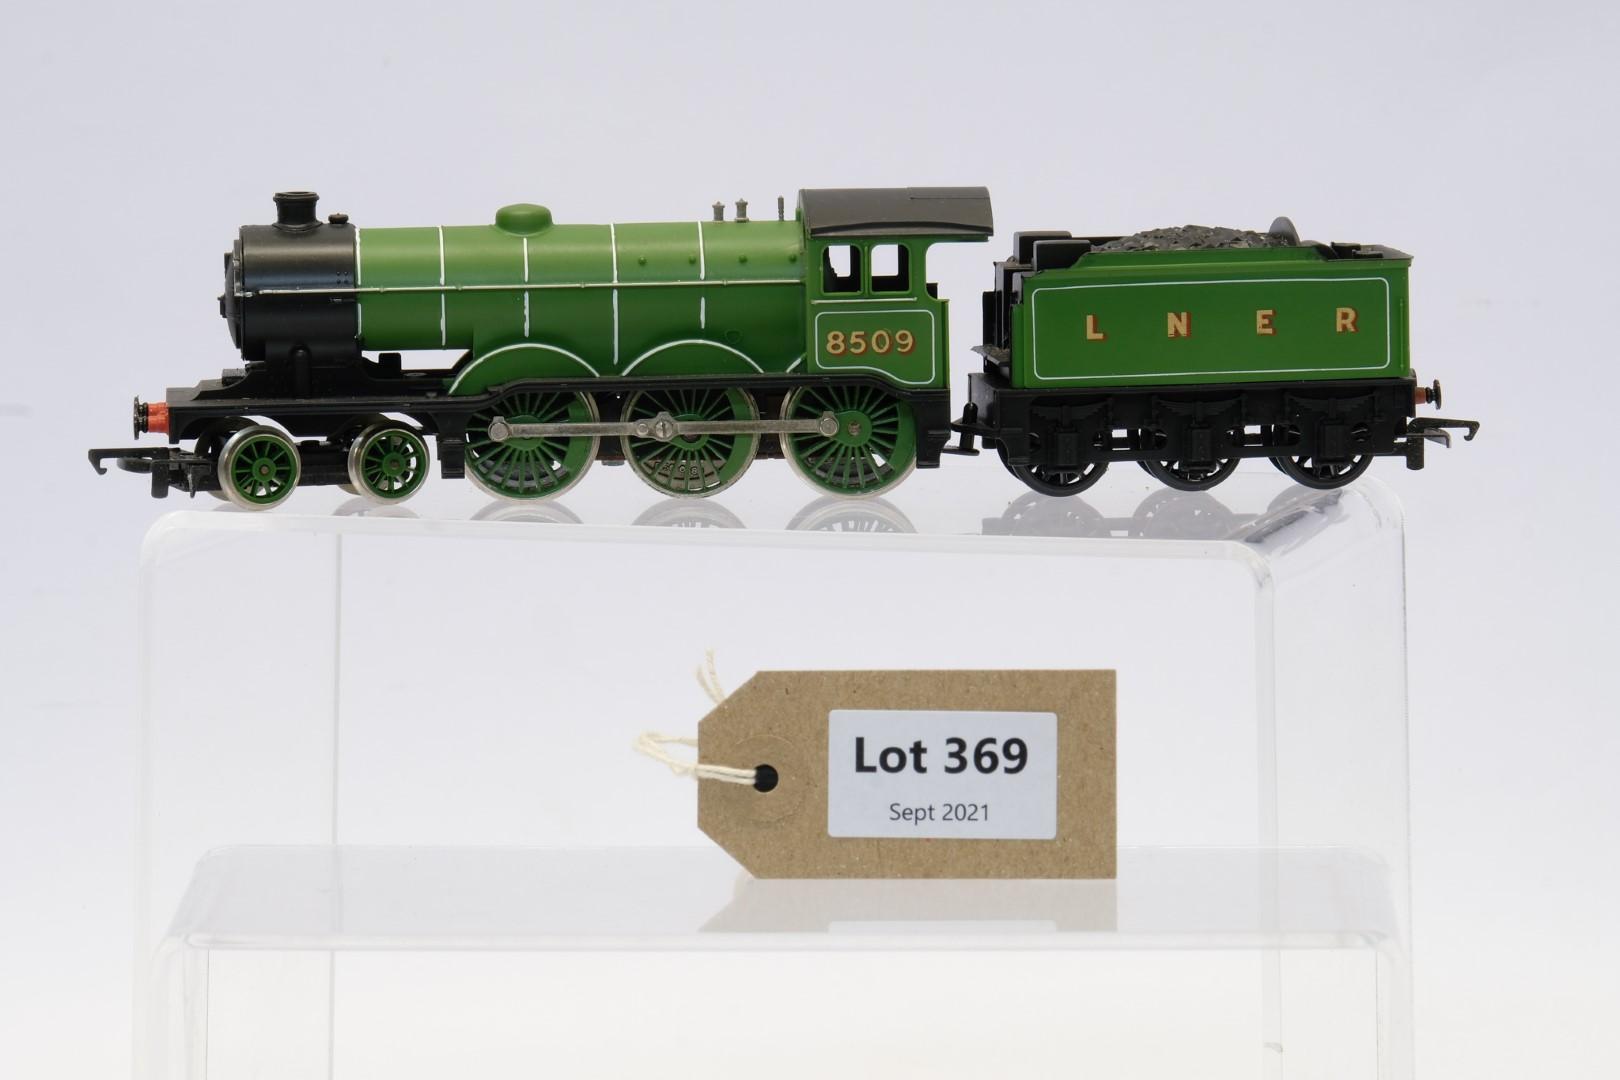 Hornby Class B12 Locomotive And Tender LNER 8509 - No Box